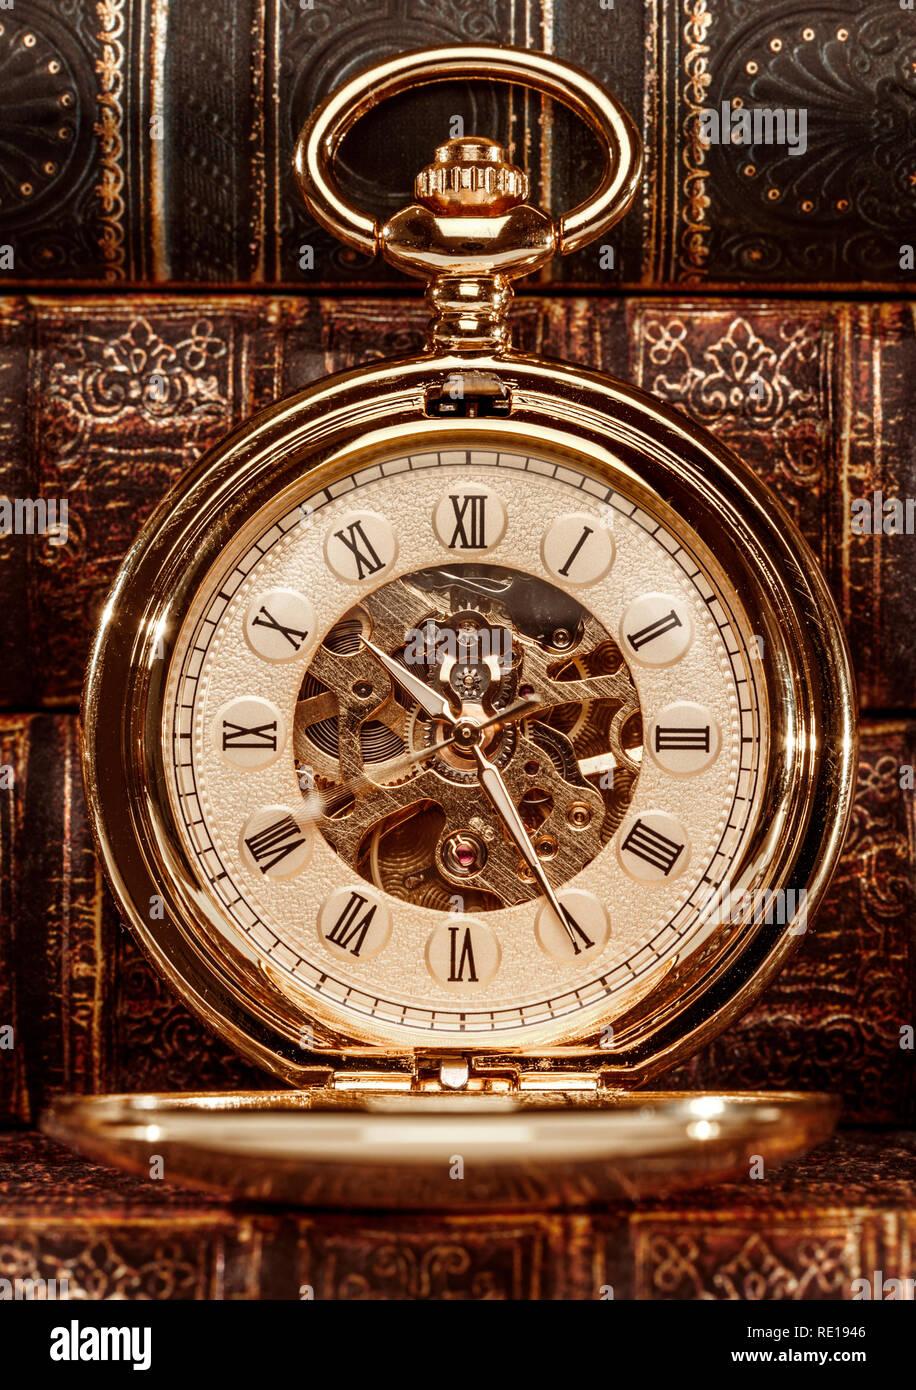 Antique clock dial close-up. Vintage pocket watch. - Stock Image